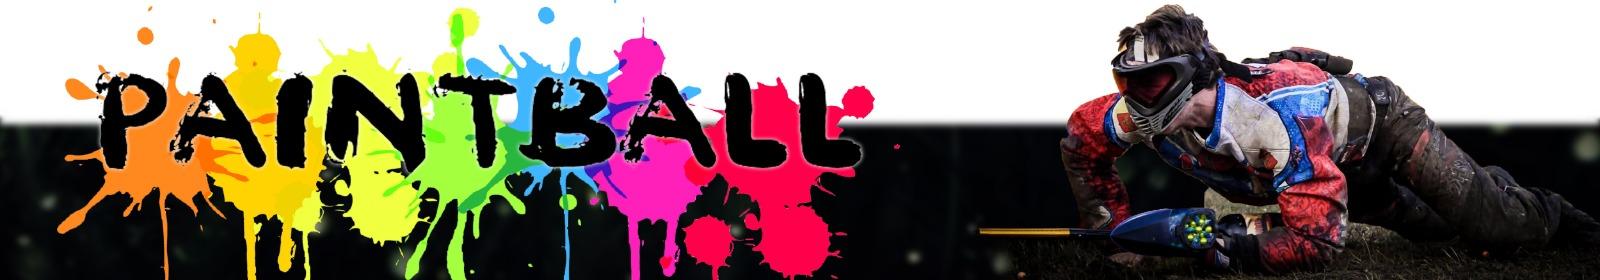 Banner Paintball